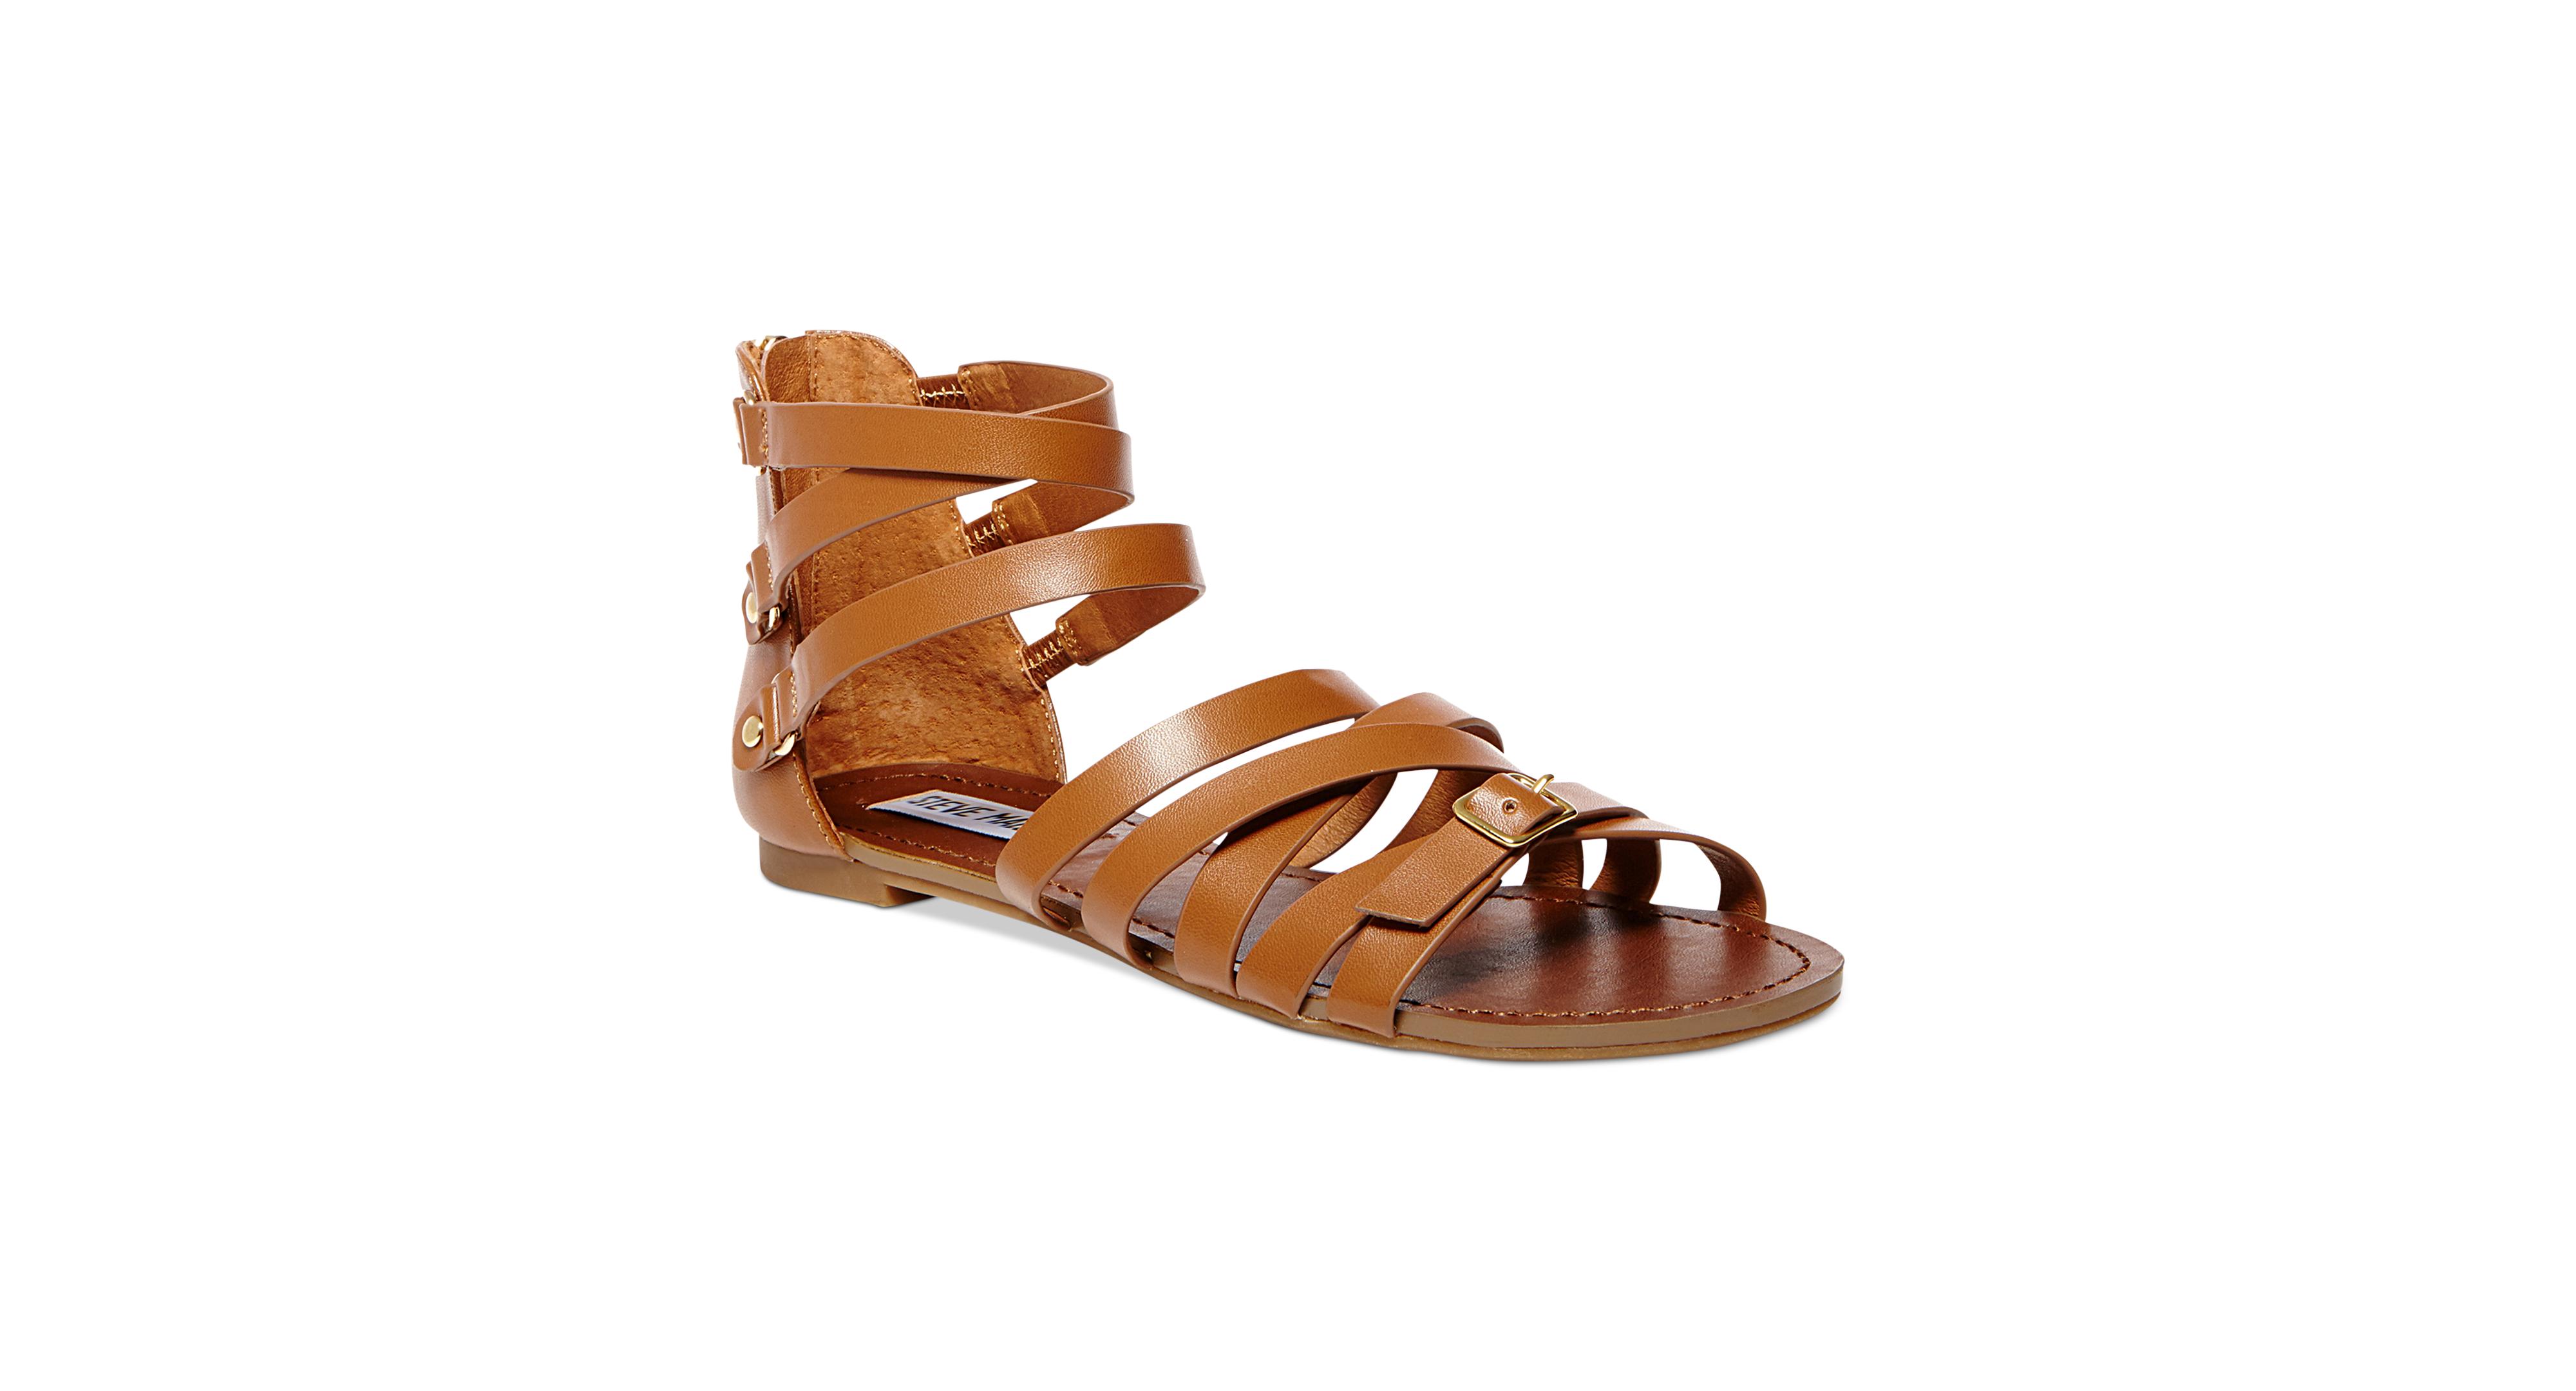 Steve Madden Women's Worldly Flat Sandals